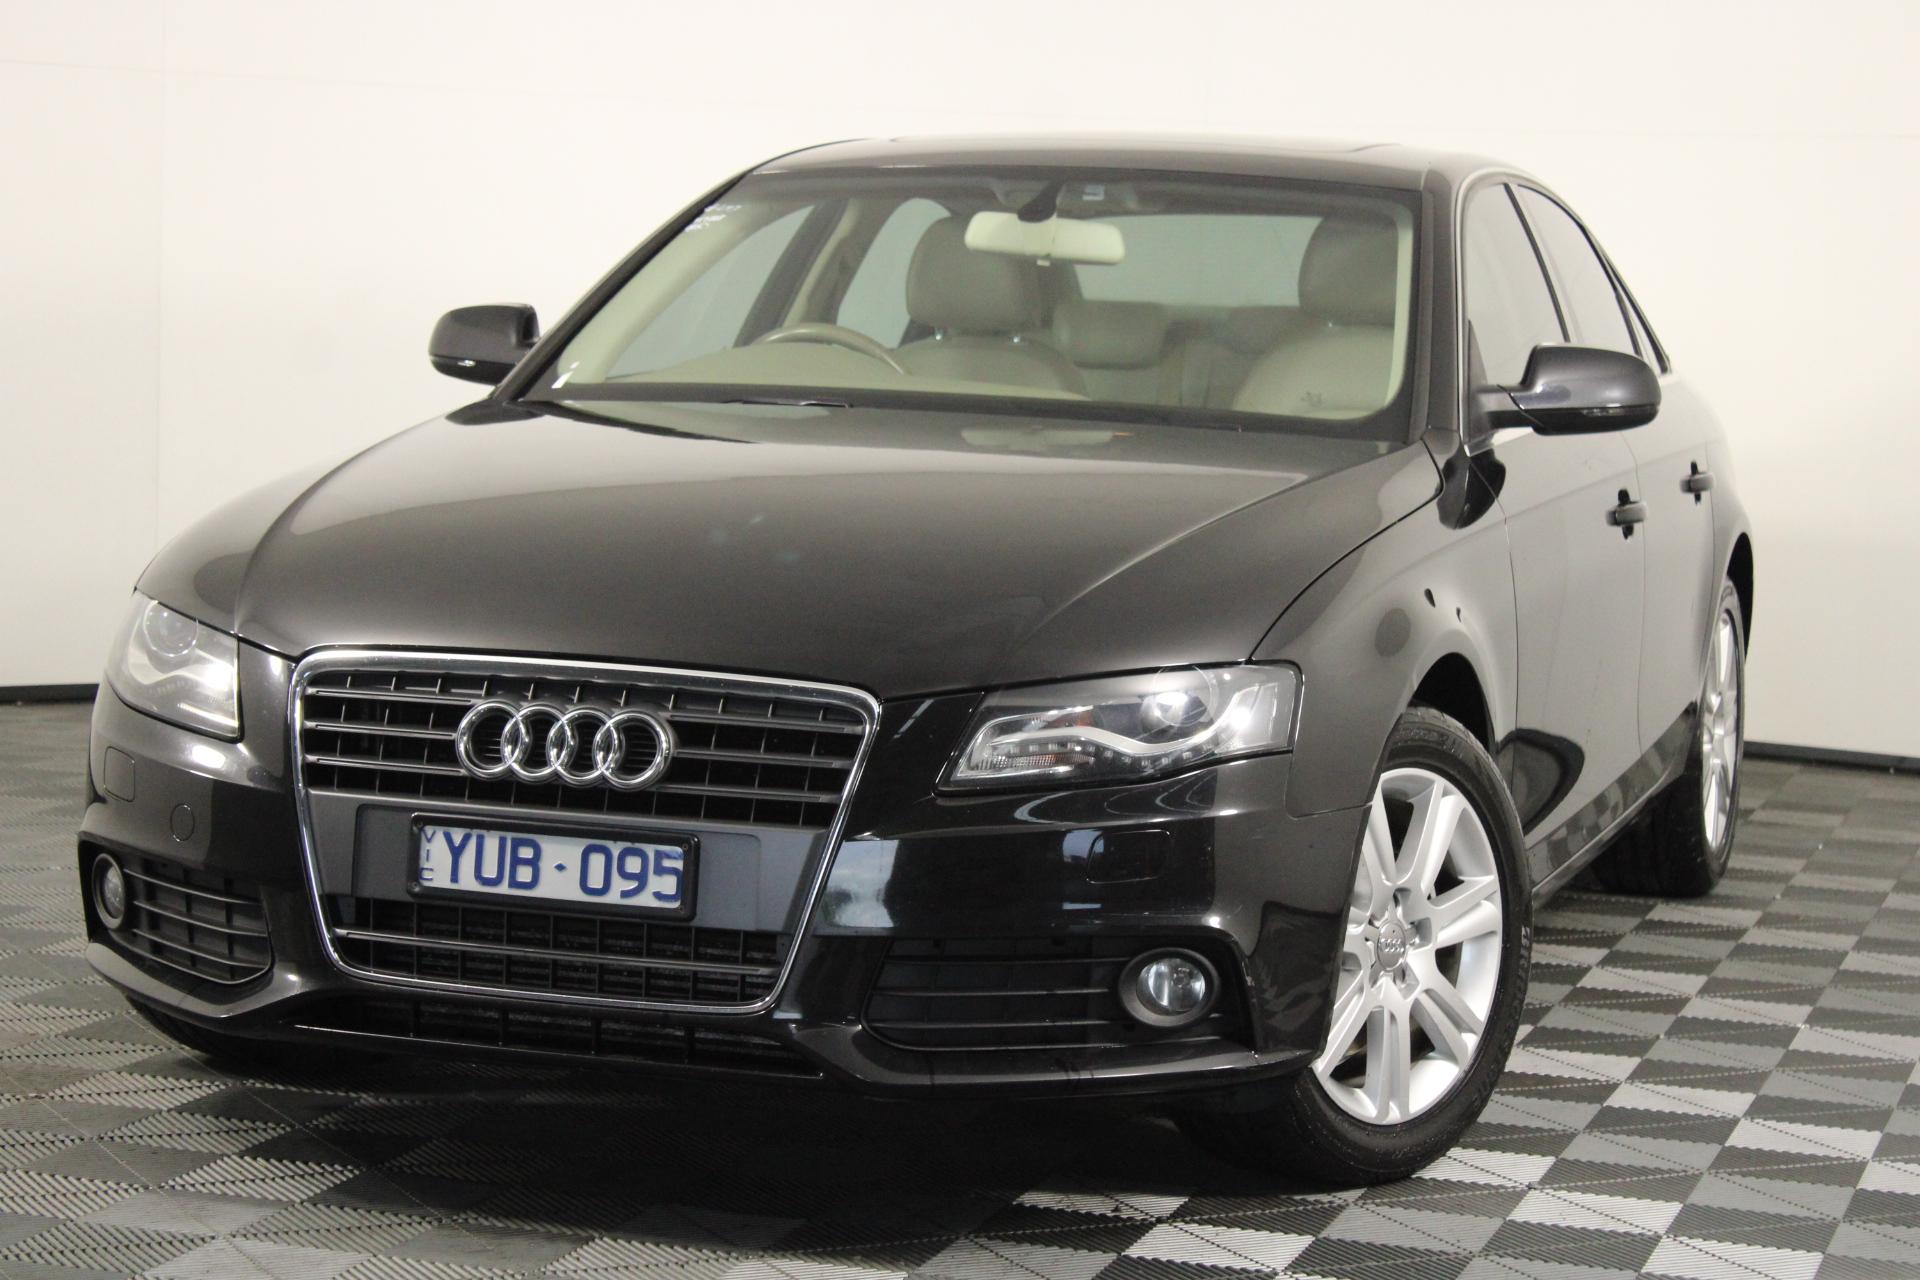 2012 Audi A4 2.0 TDI B8 Turbo Diesel CVT Sedan